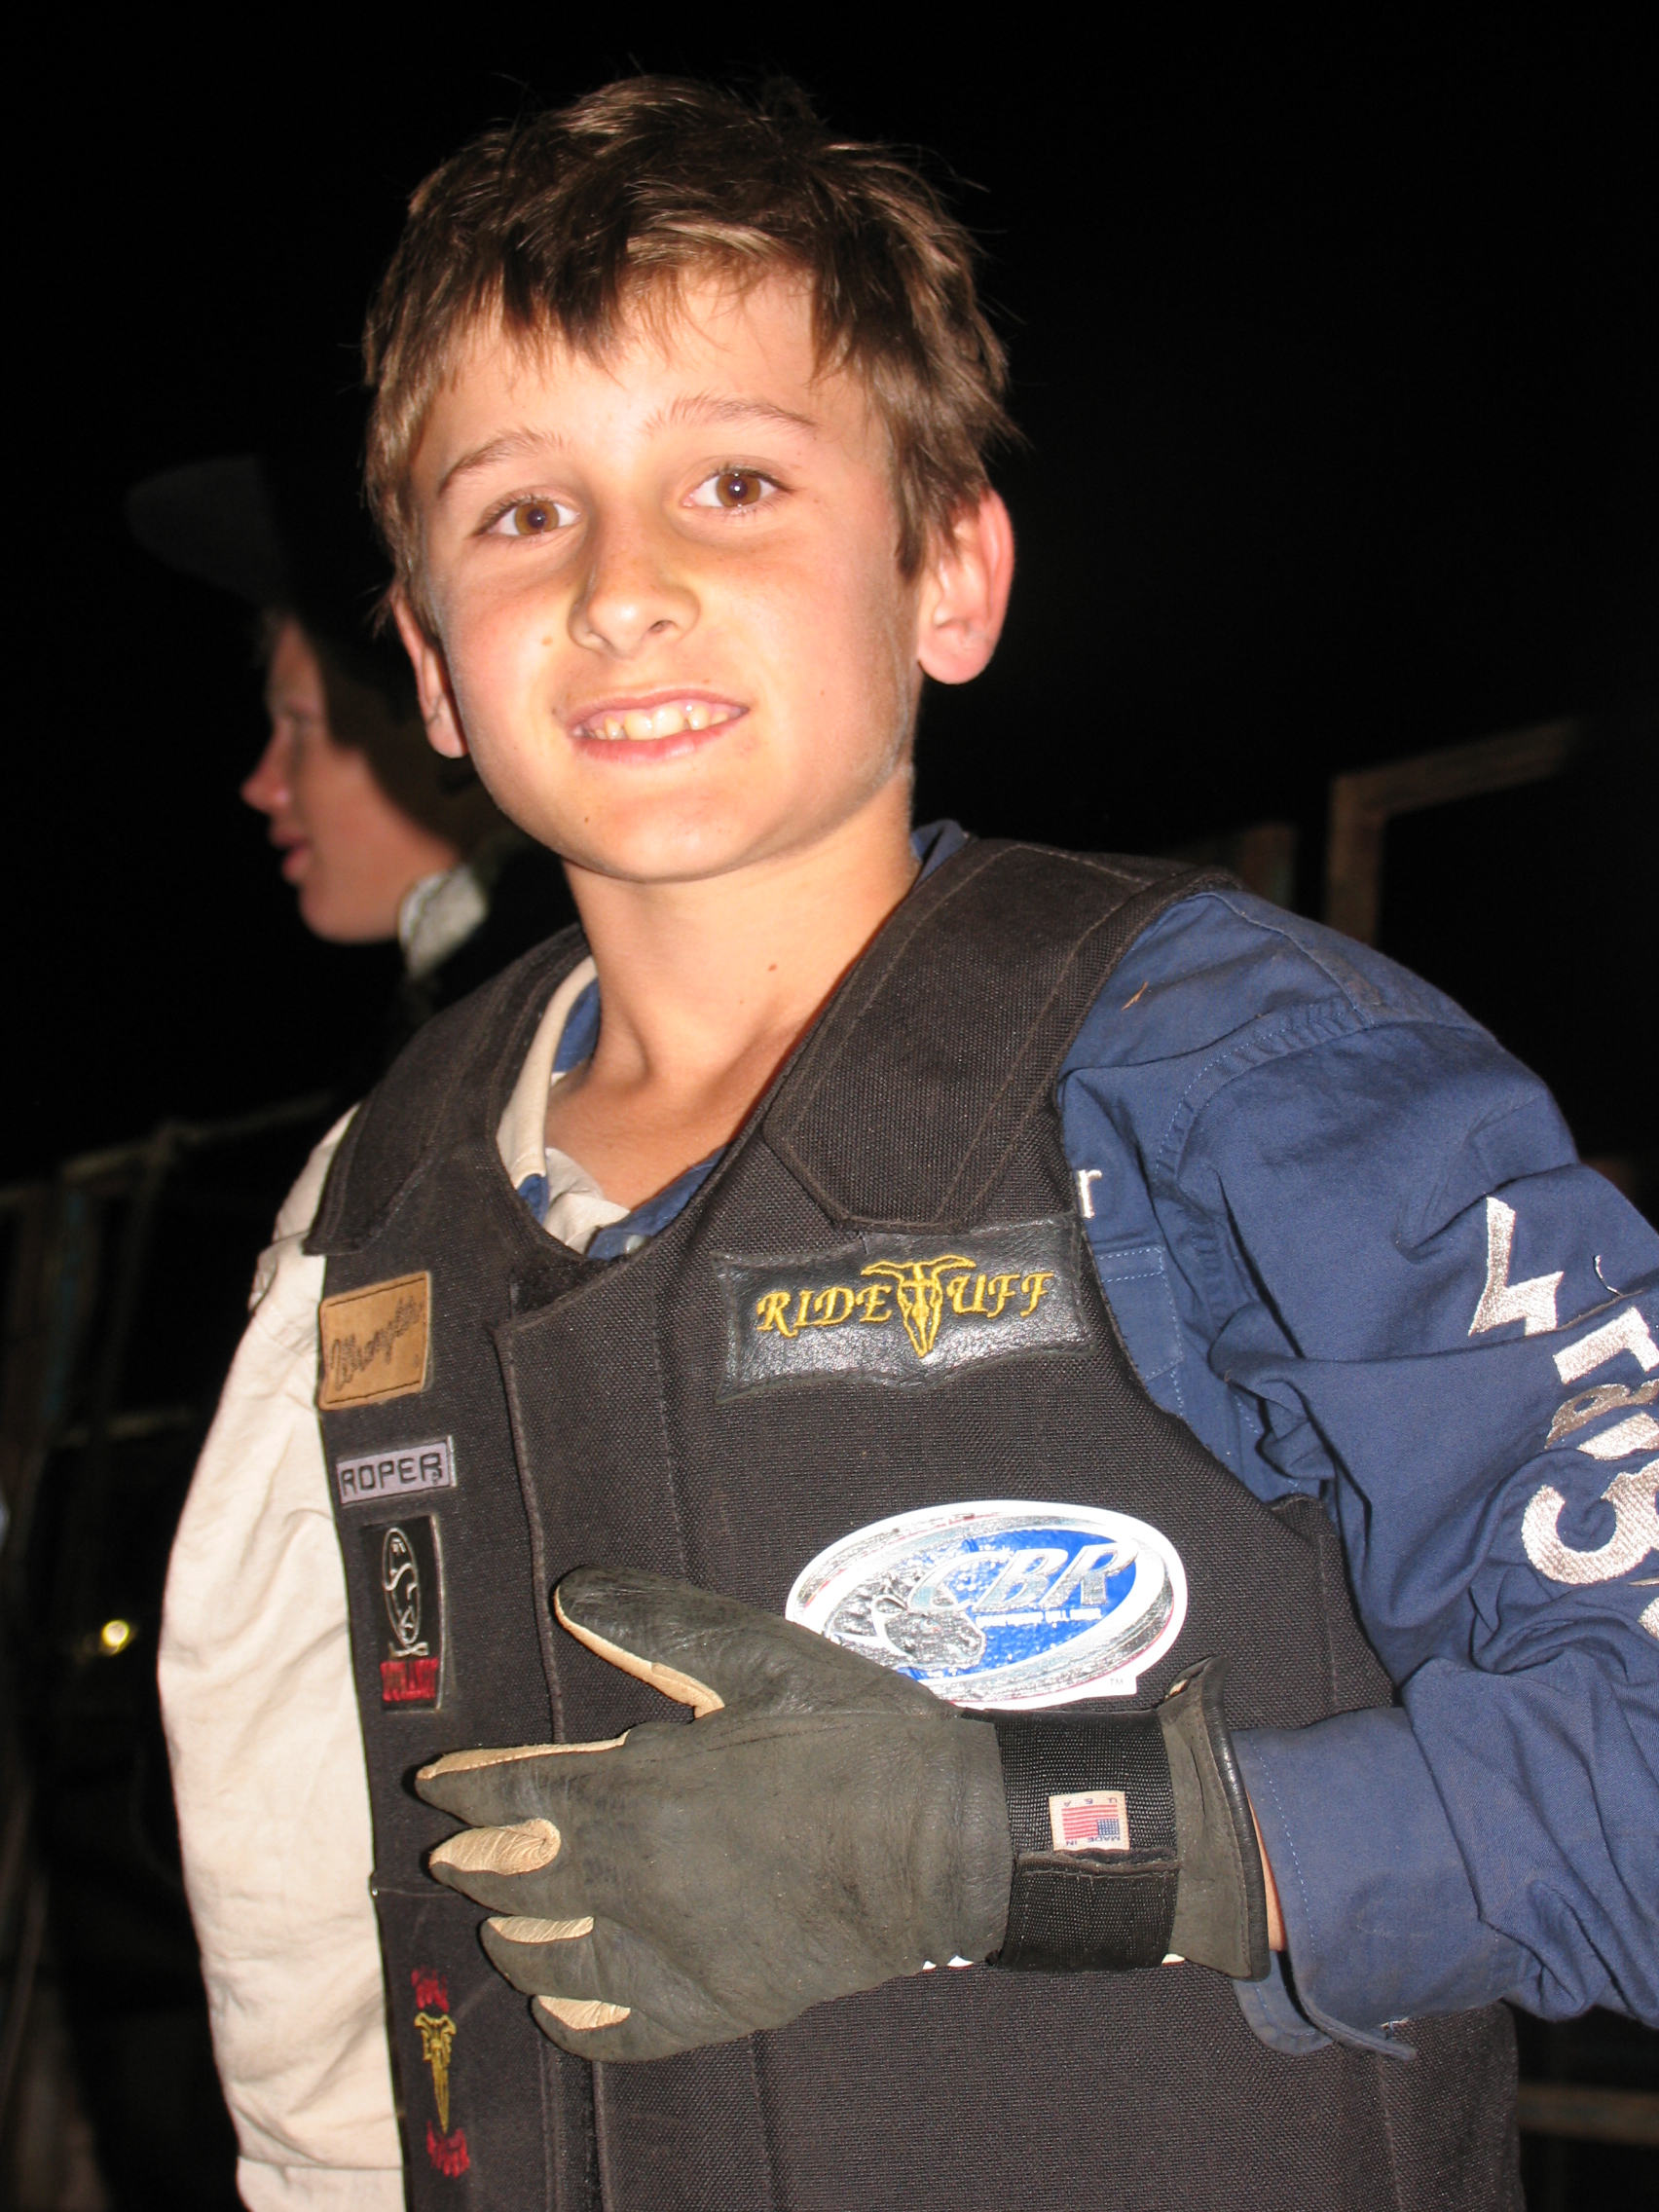 Luke Russo -after his winning ride